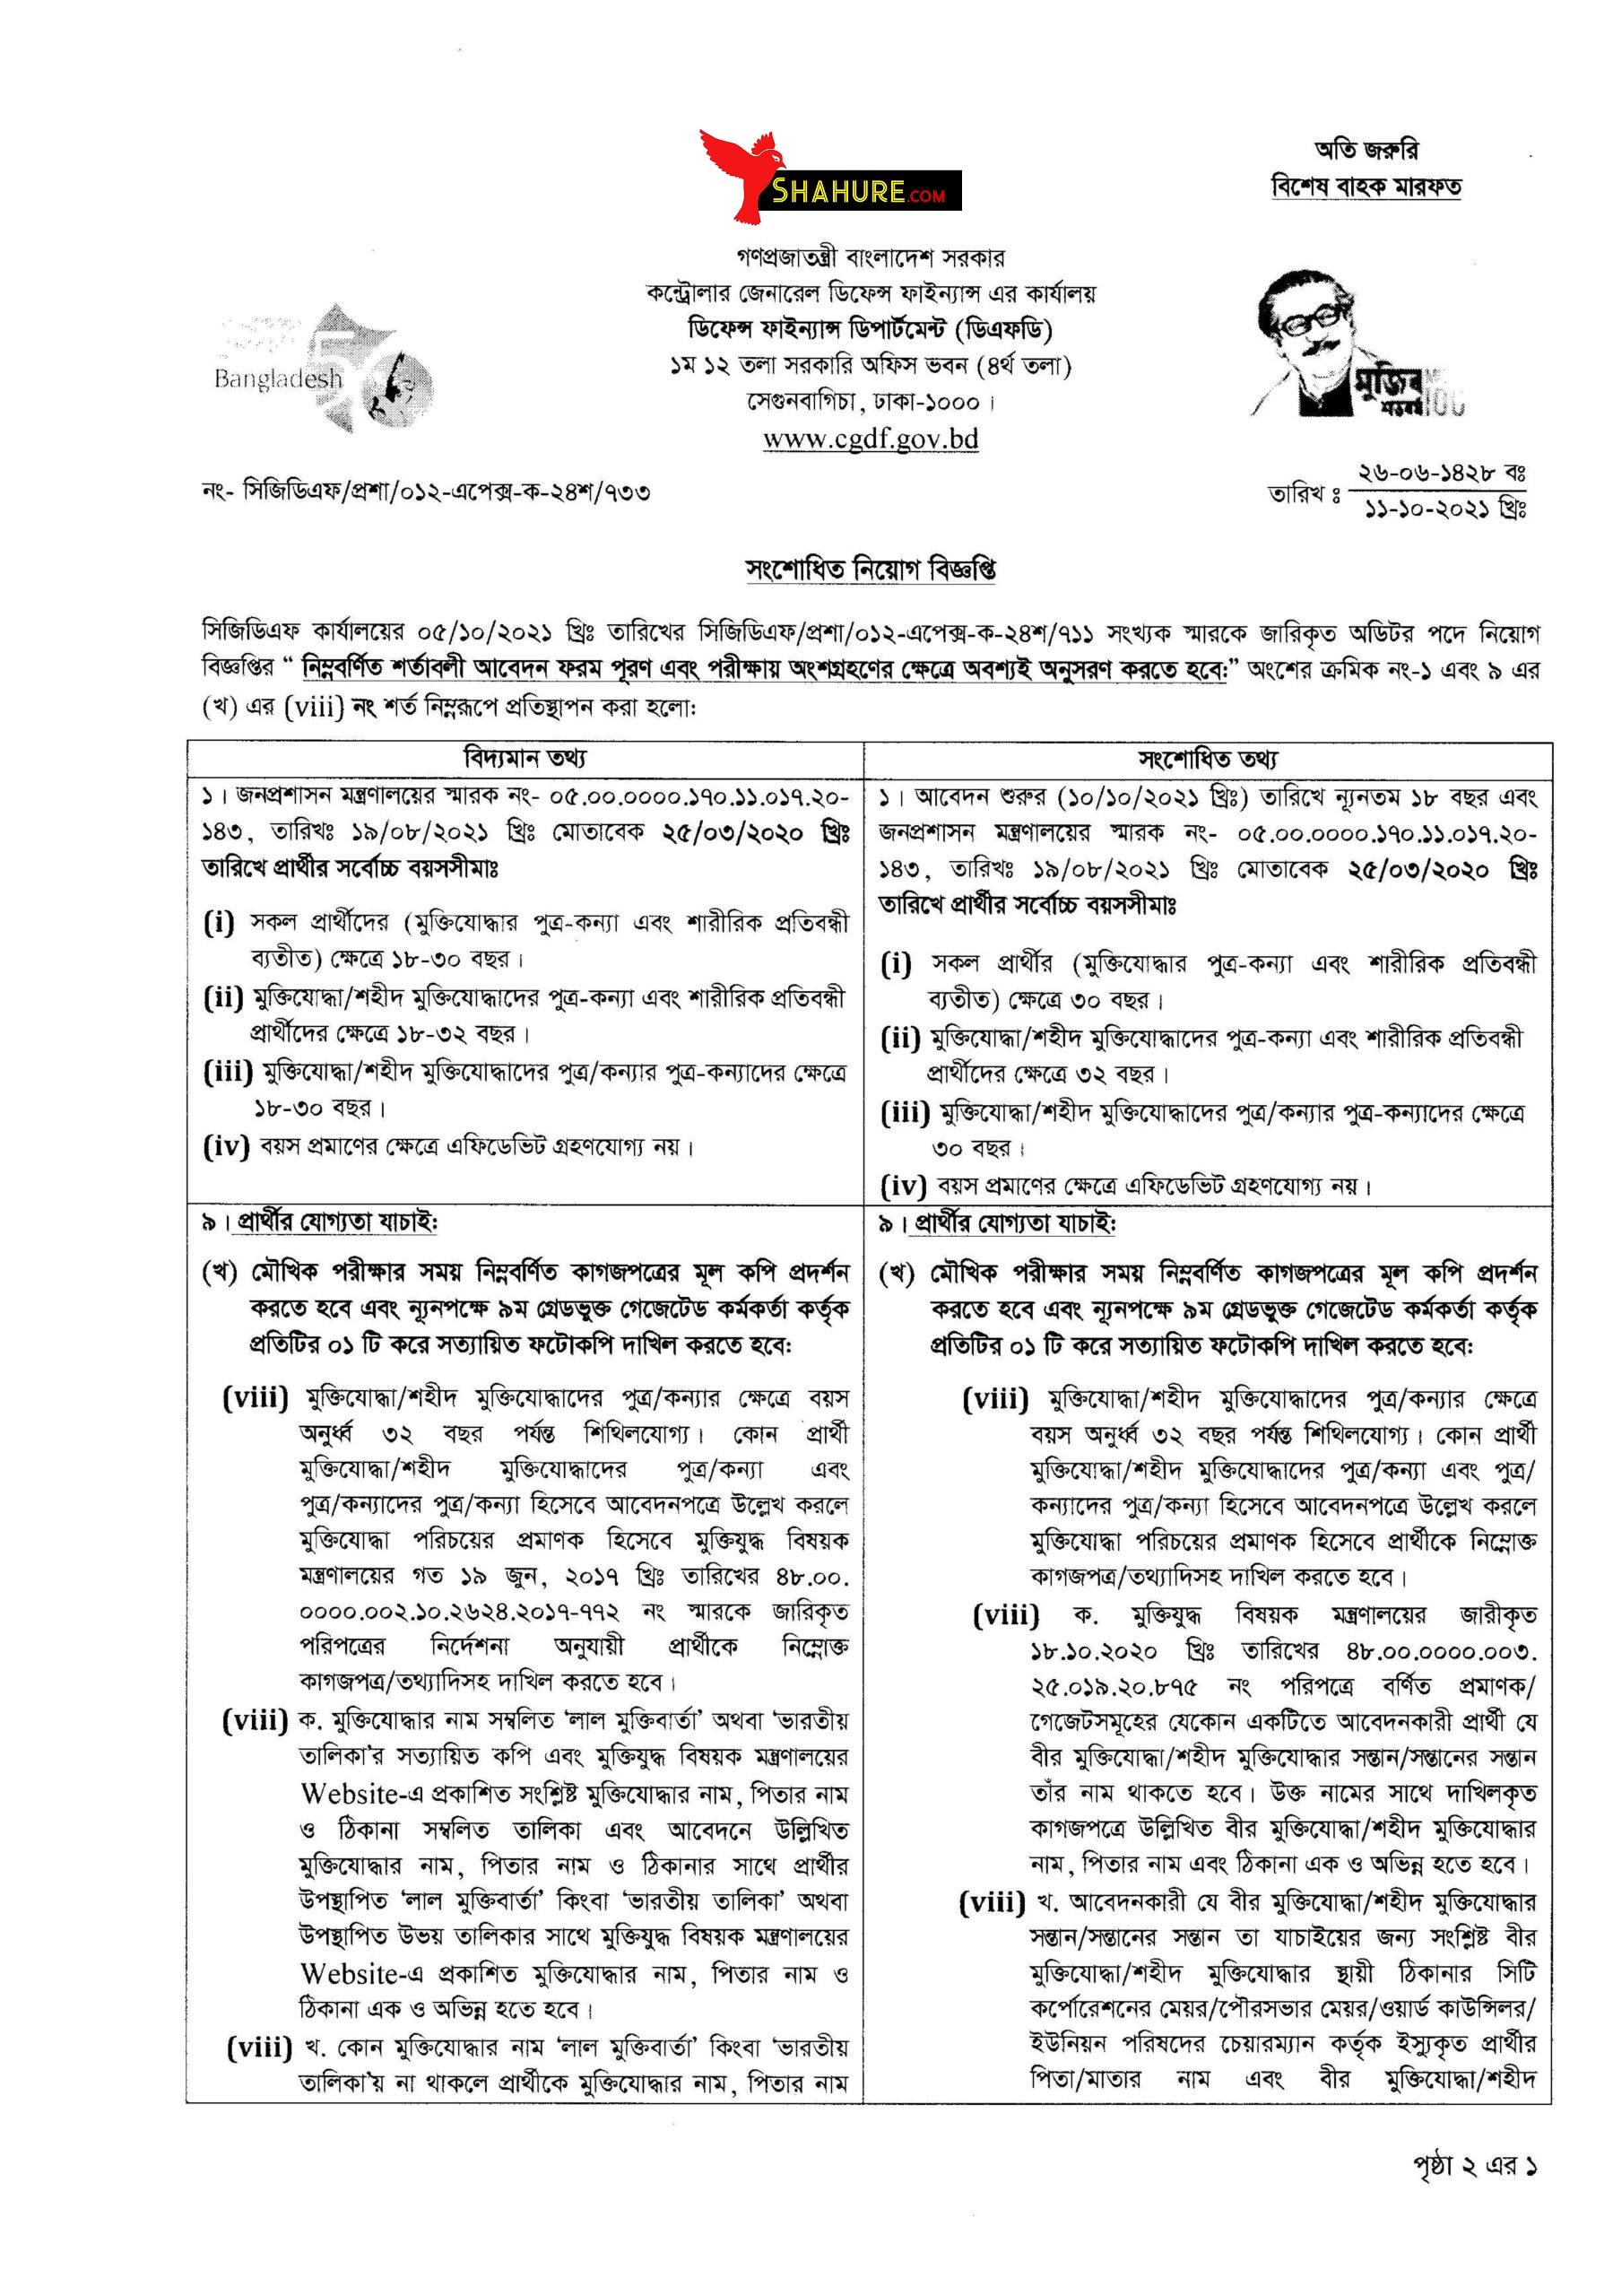 CGDF Auditor Revised Job Circular 2021